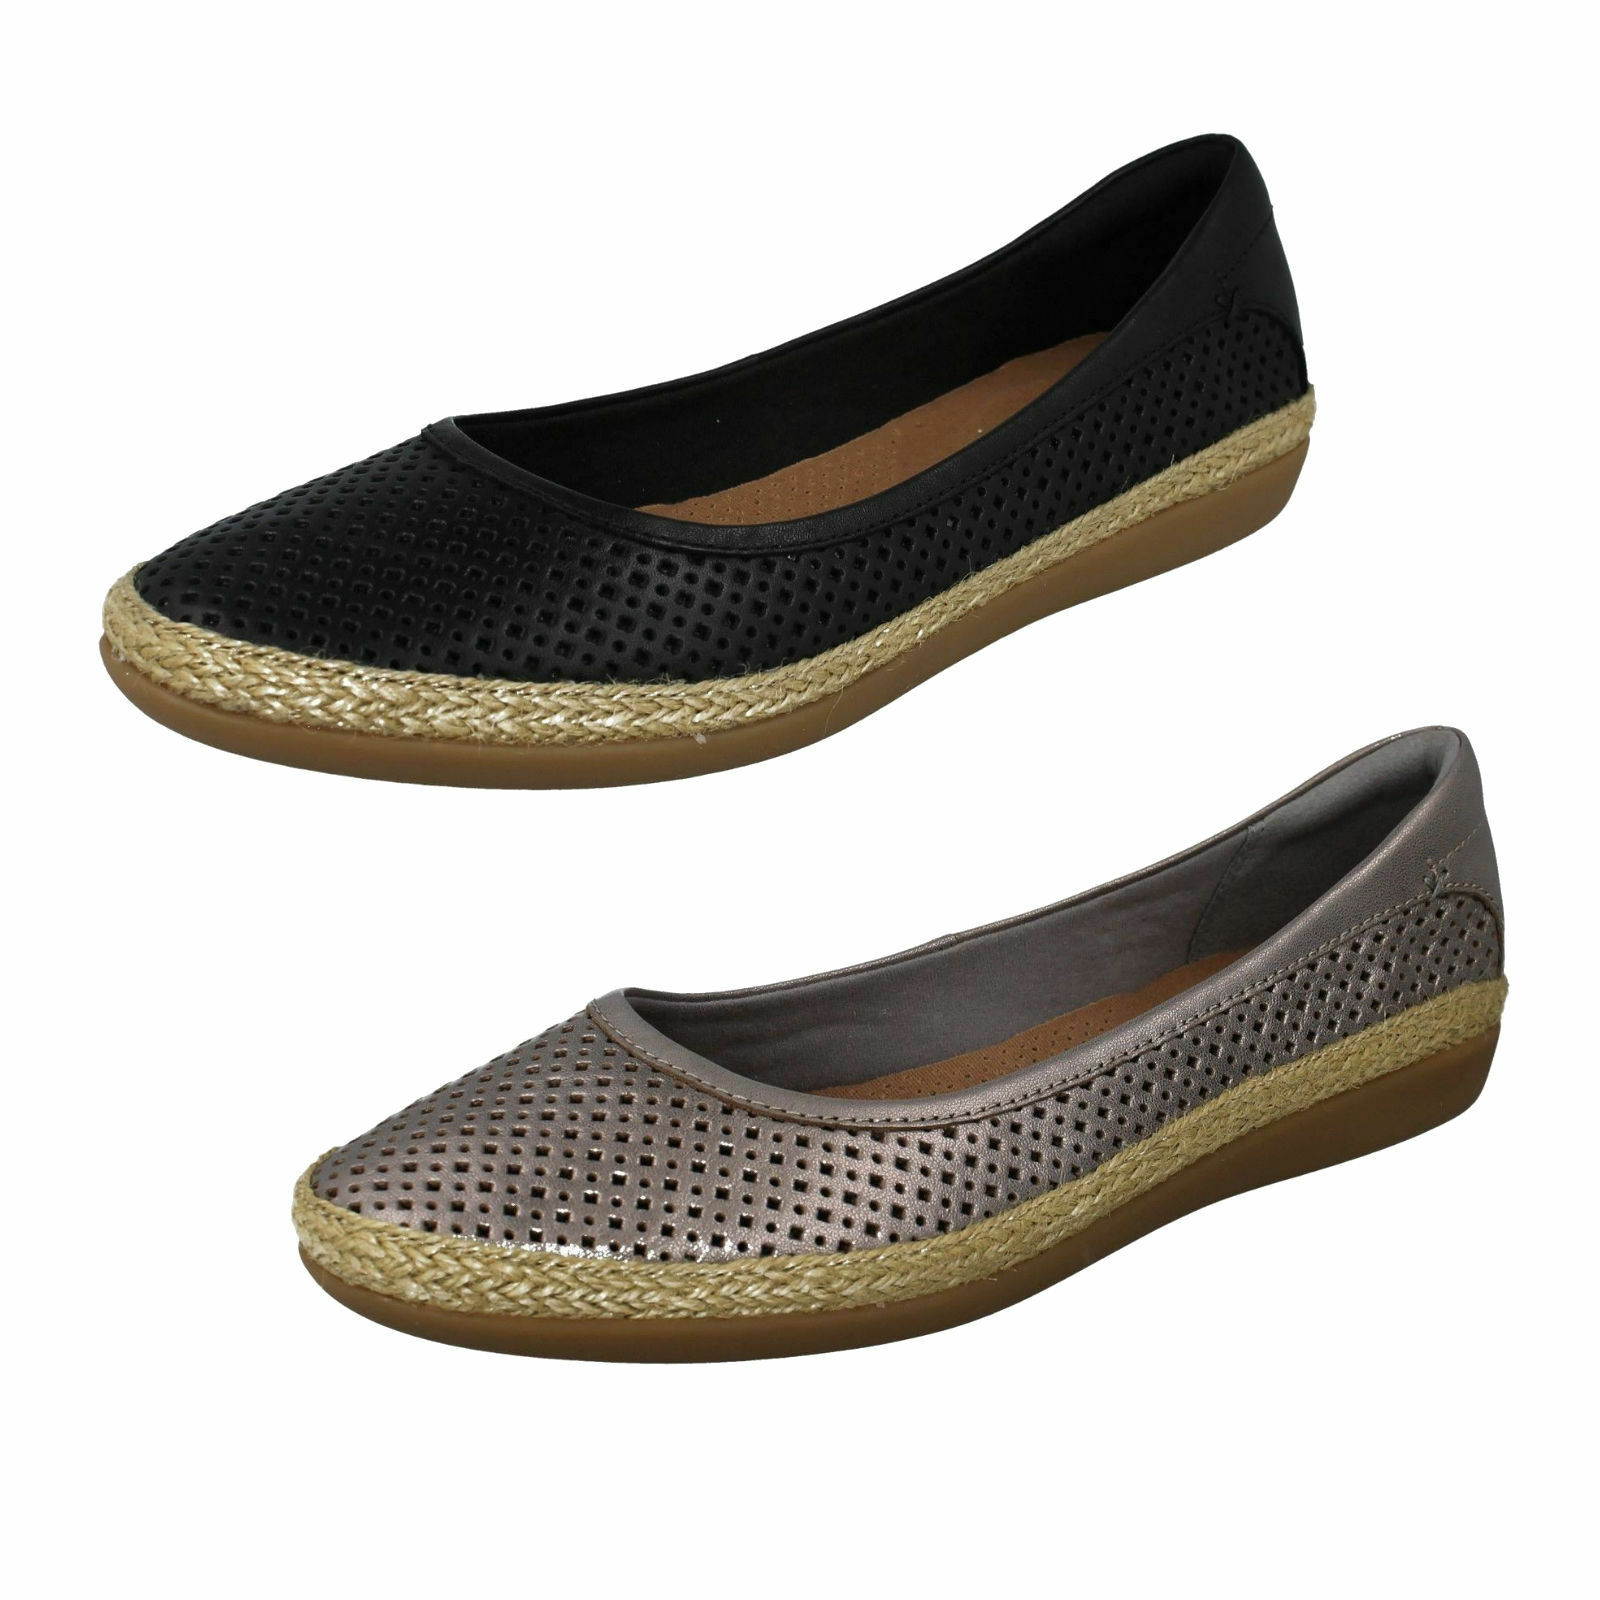 Donna Clarks Scarpe Slip-On - Danelly Adira